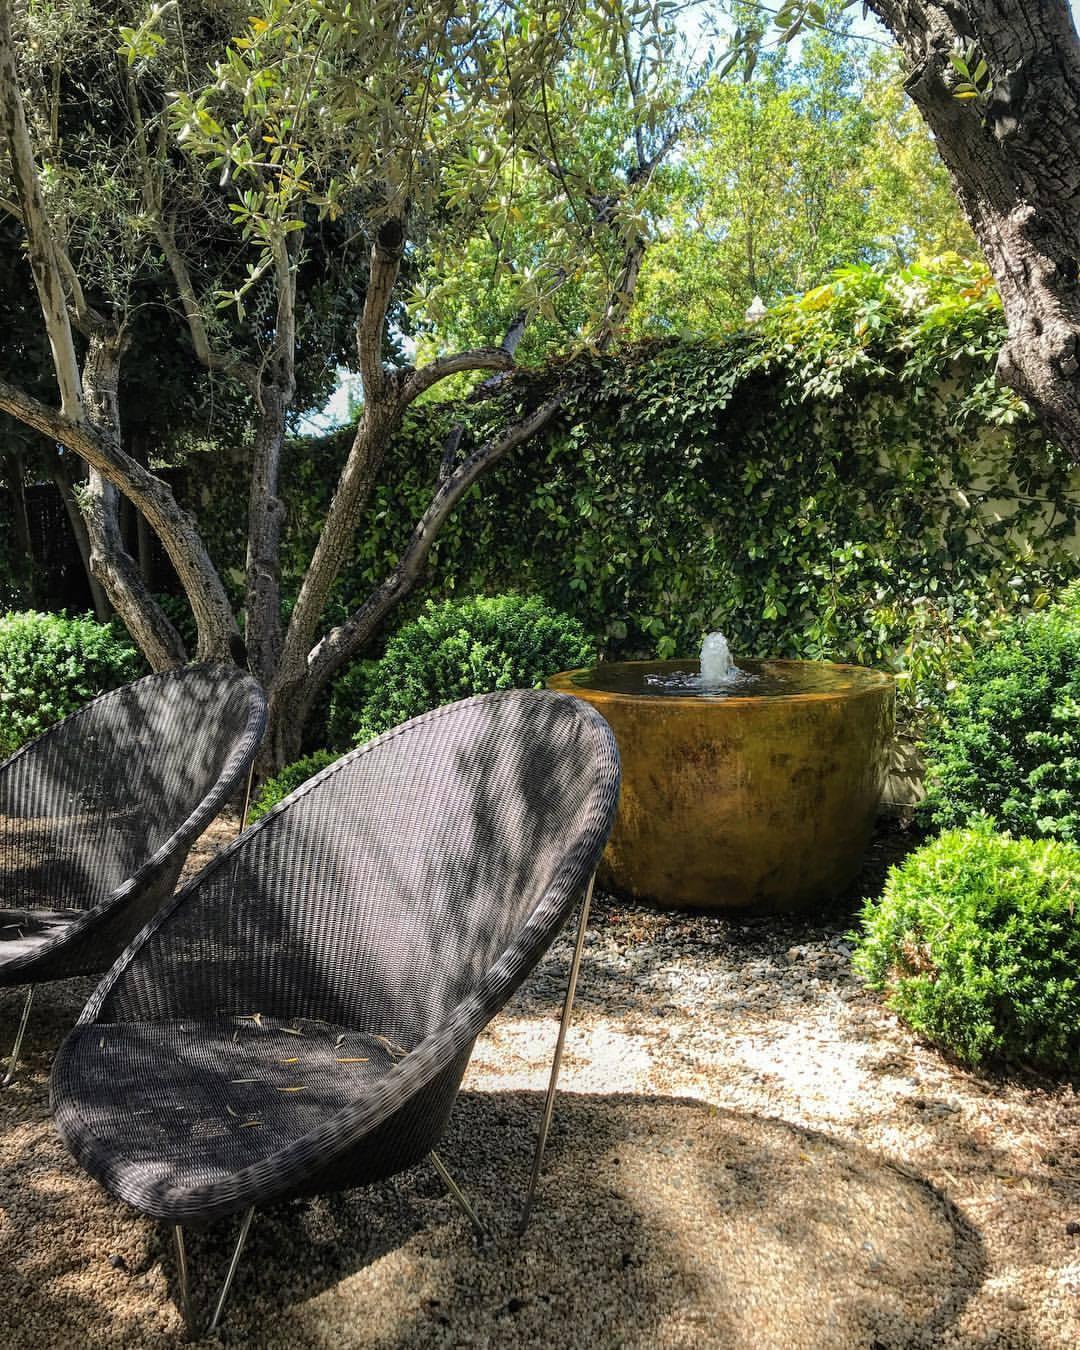 A quiet spot.  -  #california #sonomacounty #springhassprung  (at Healdsburg, California)